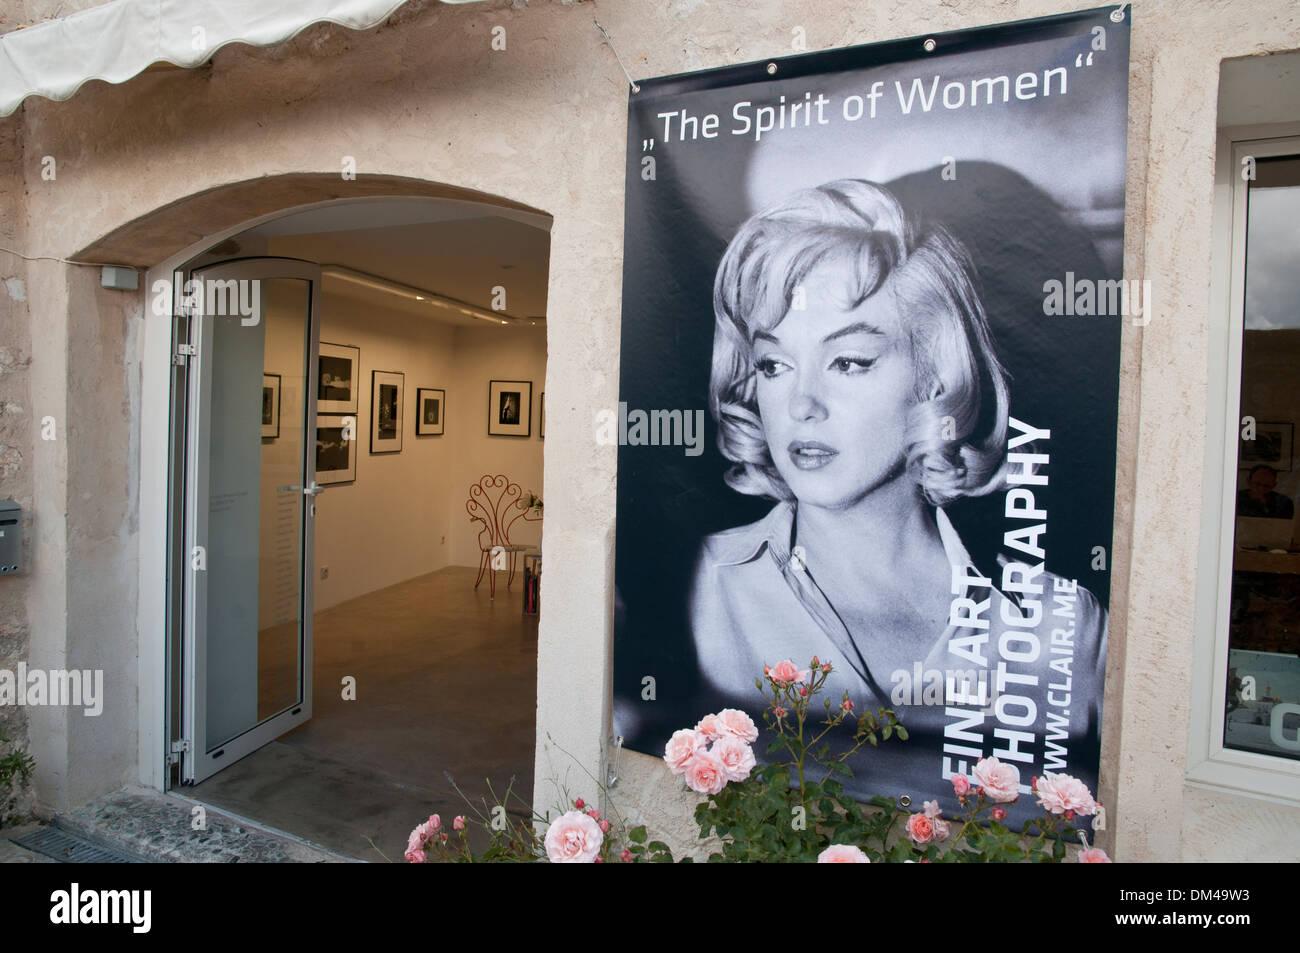 Poster of Marilyn Monroe near Gallery entrance, Saint-Paul-de-Vence, southeastern France, French Riviera, Europe. - Stock Image